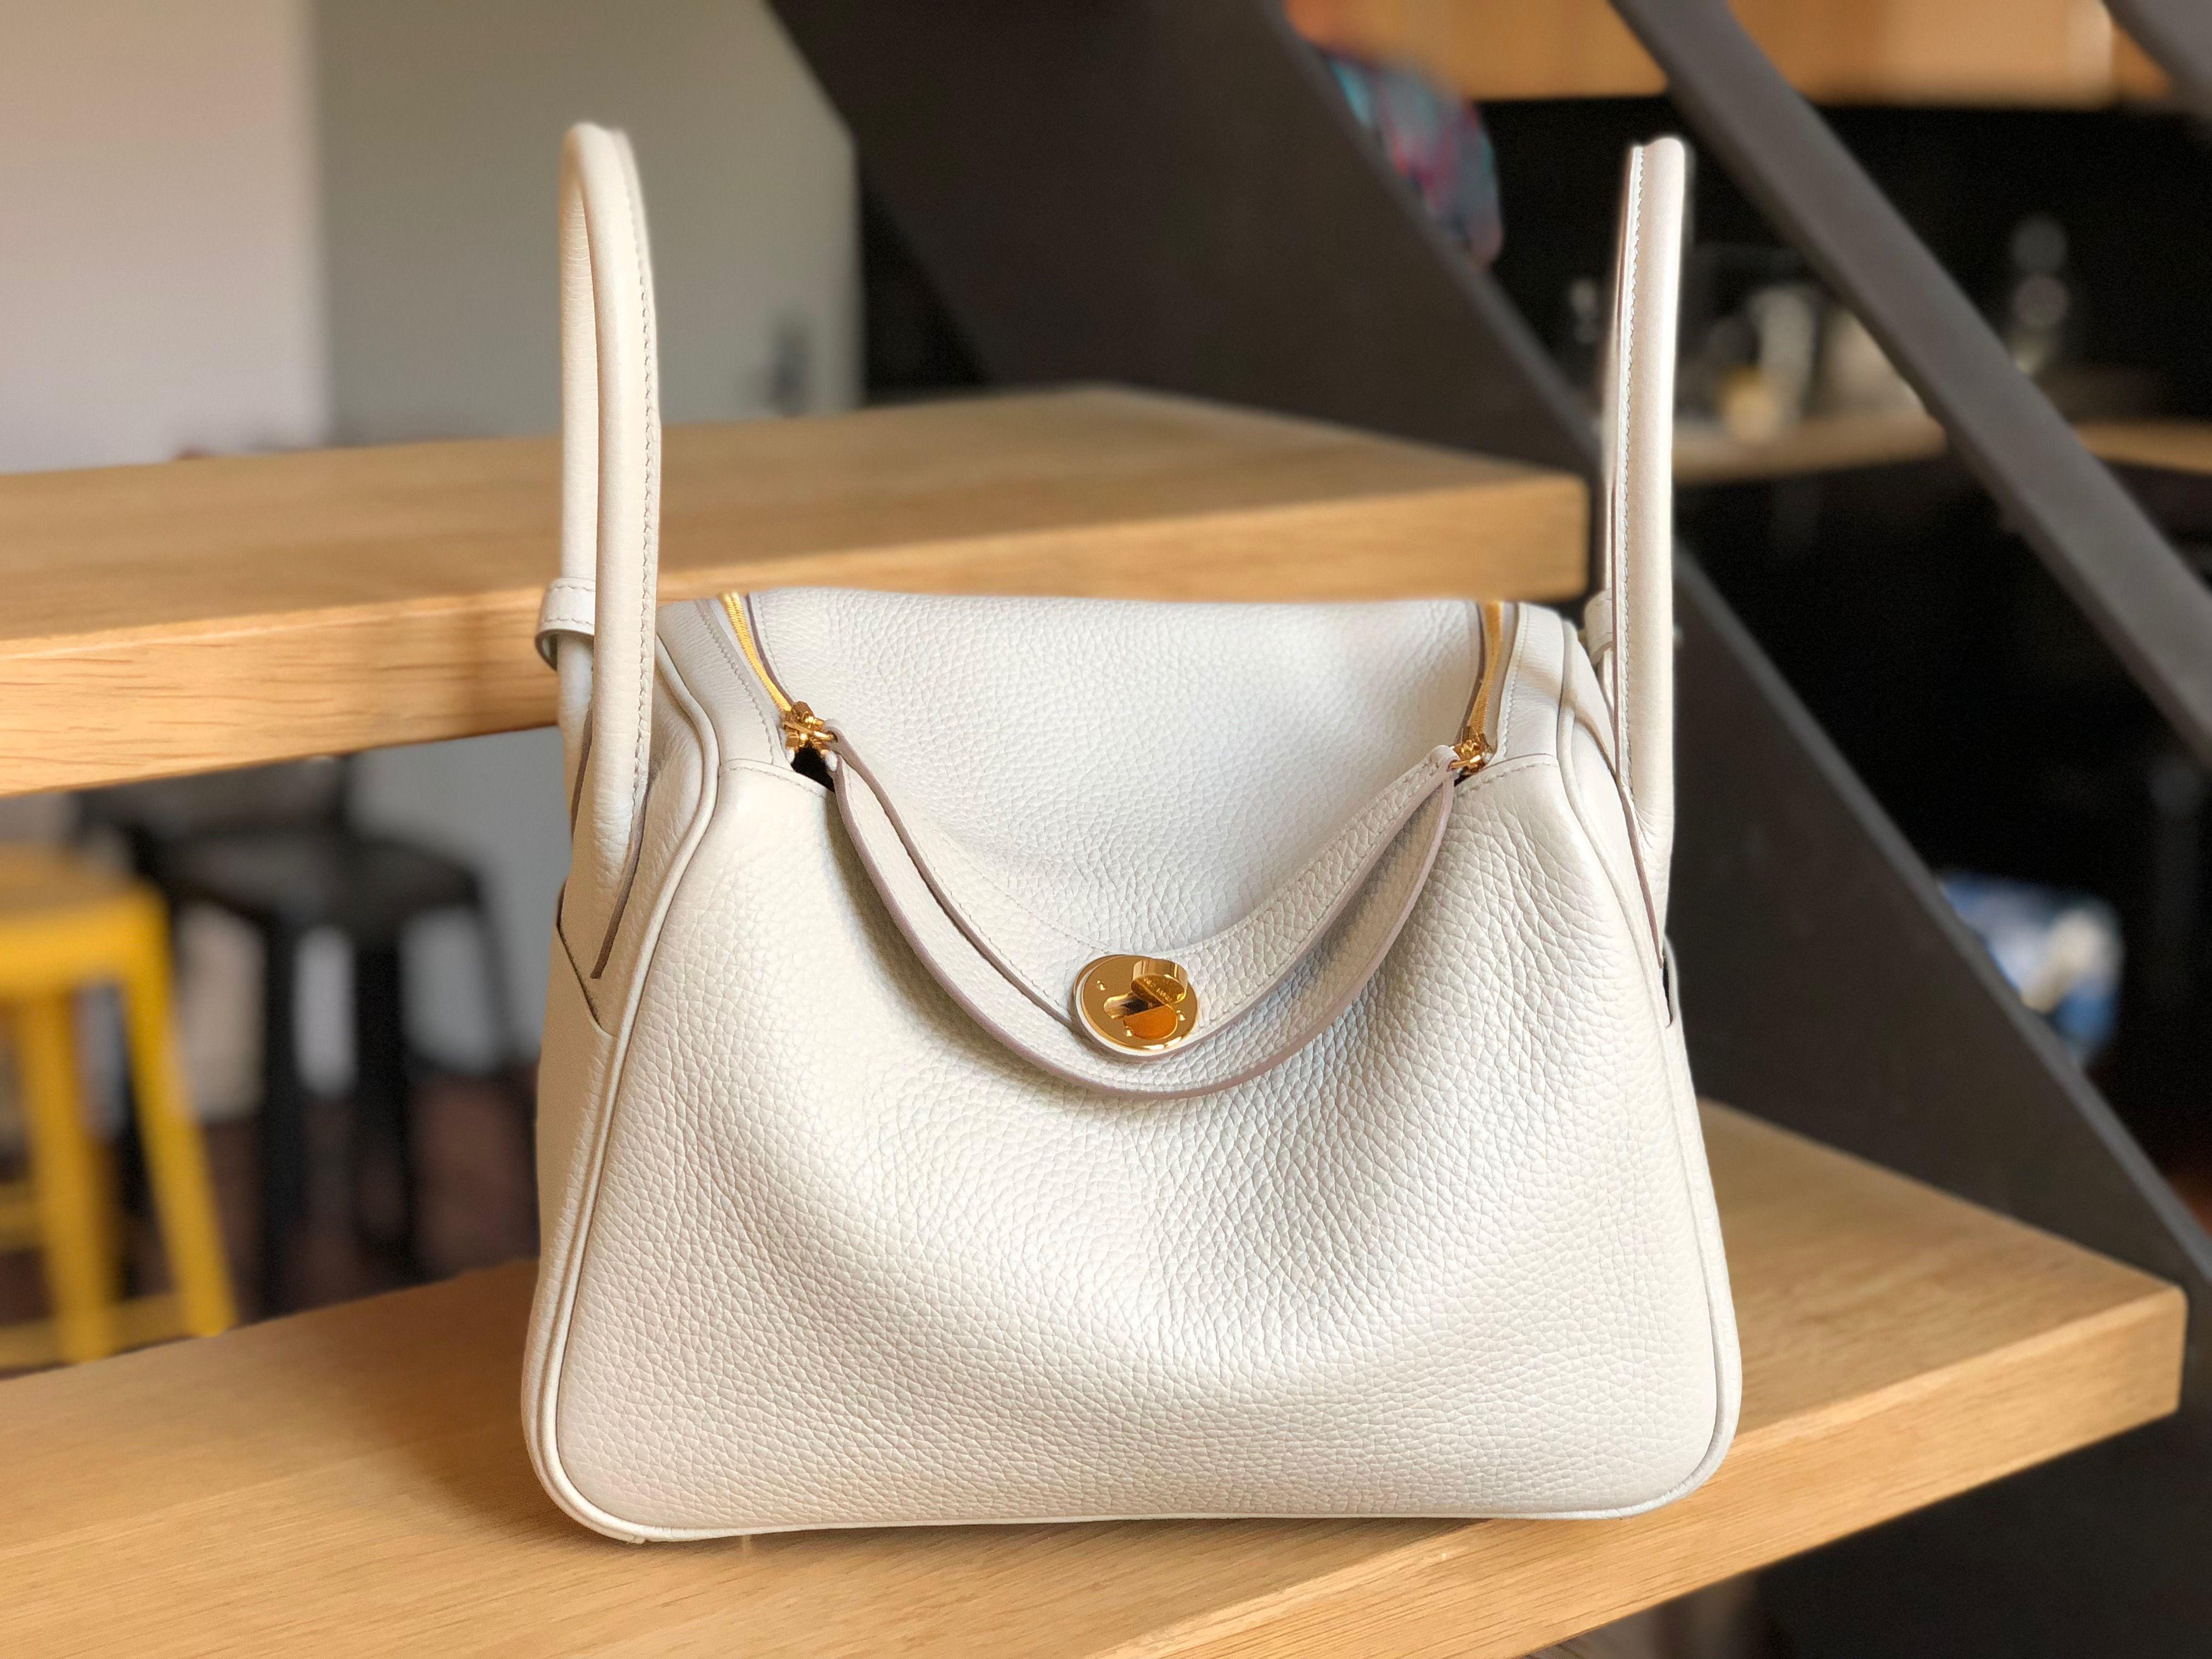 750e734b59 Hermès Lindy 26 Beton ghw | Hermès in 2019 | Hermes, Bags, Bucket Bag